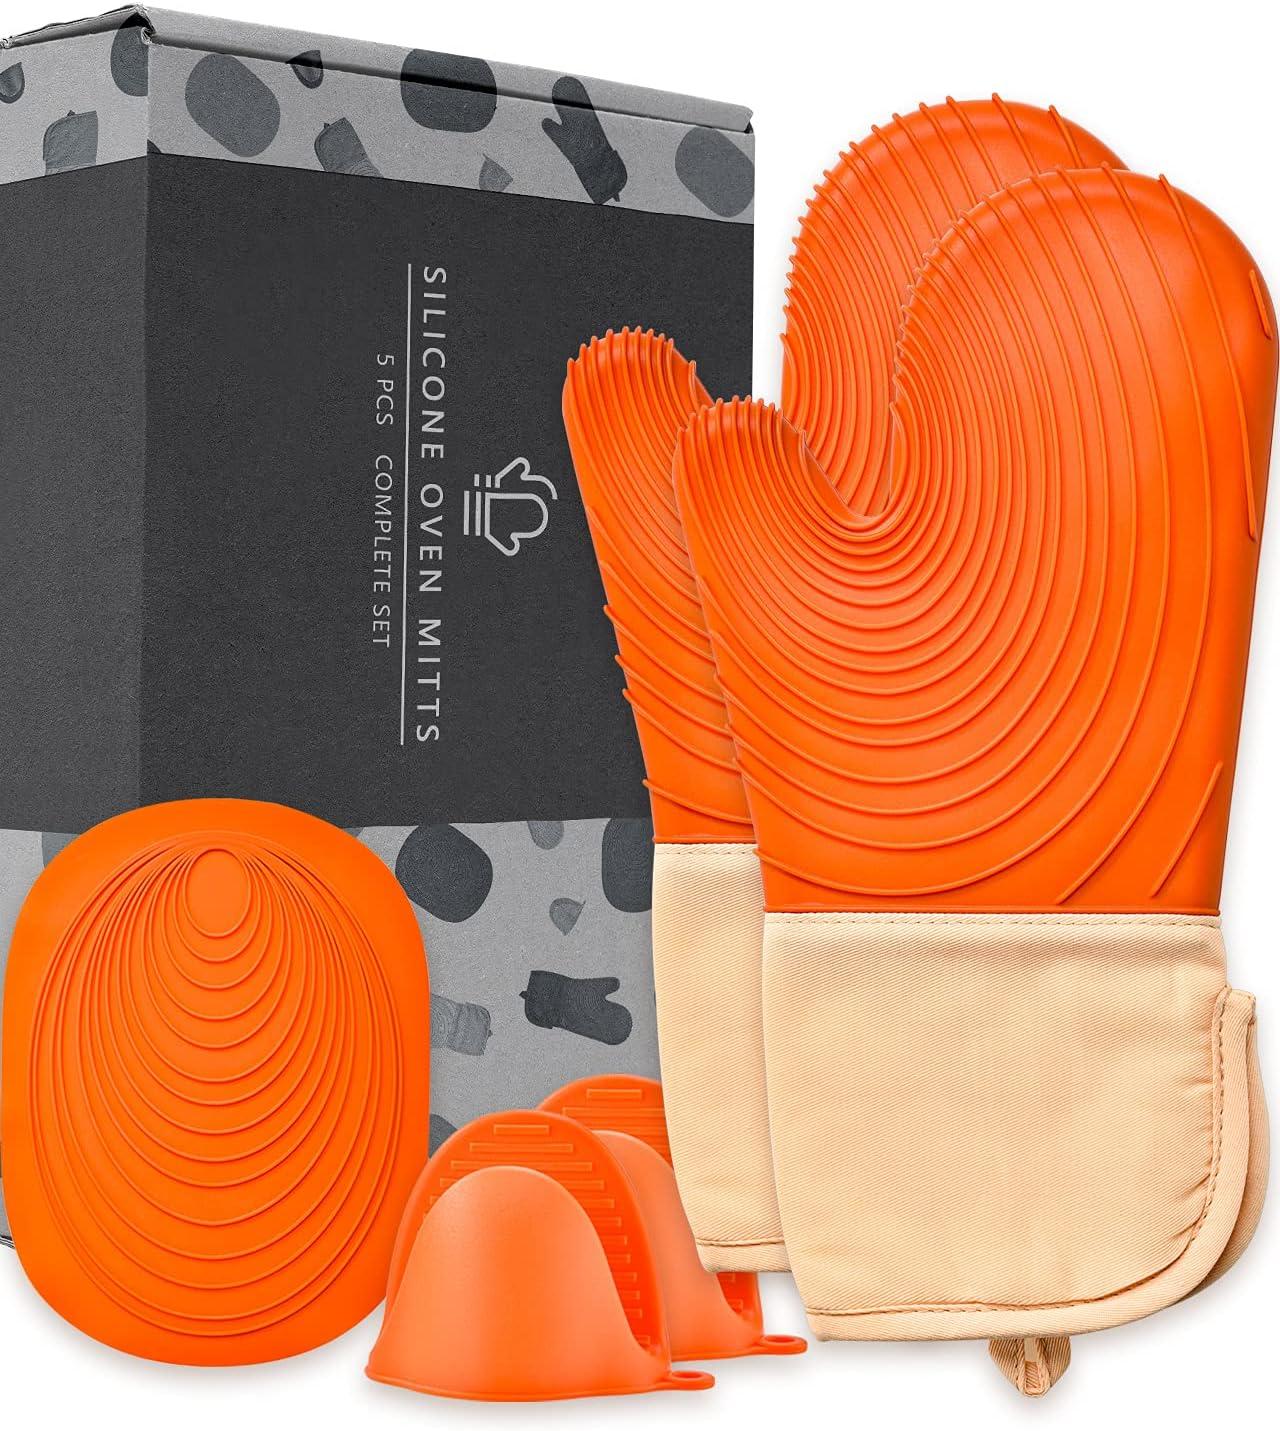 EUNA Juego de manoplas horno silicona con alfombrillas para ollas y mini macetas, guantes hornear, resistentes al calor, cocina, multiusos cocinar barbacoa, naranja camello